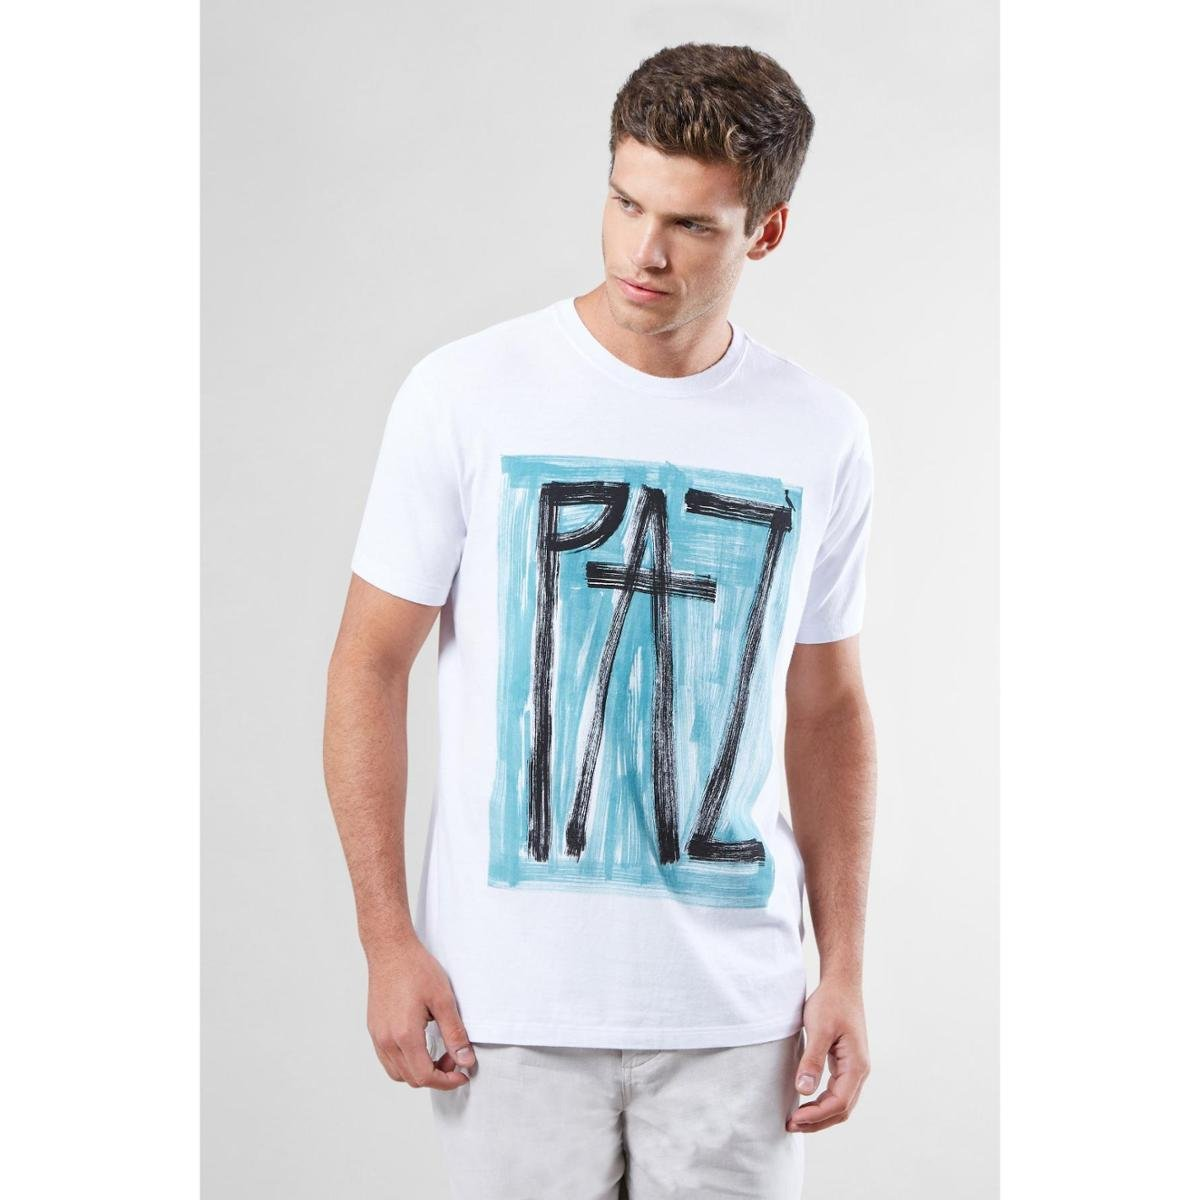 94f5943c5c Camiseta Pf Estampada Paz Reserva Masculina - Branco - Compre Agora ...